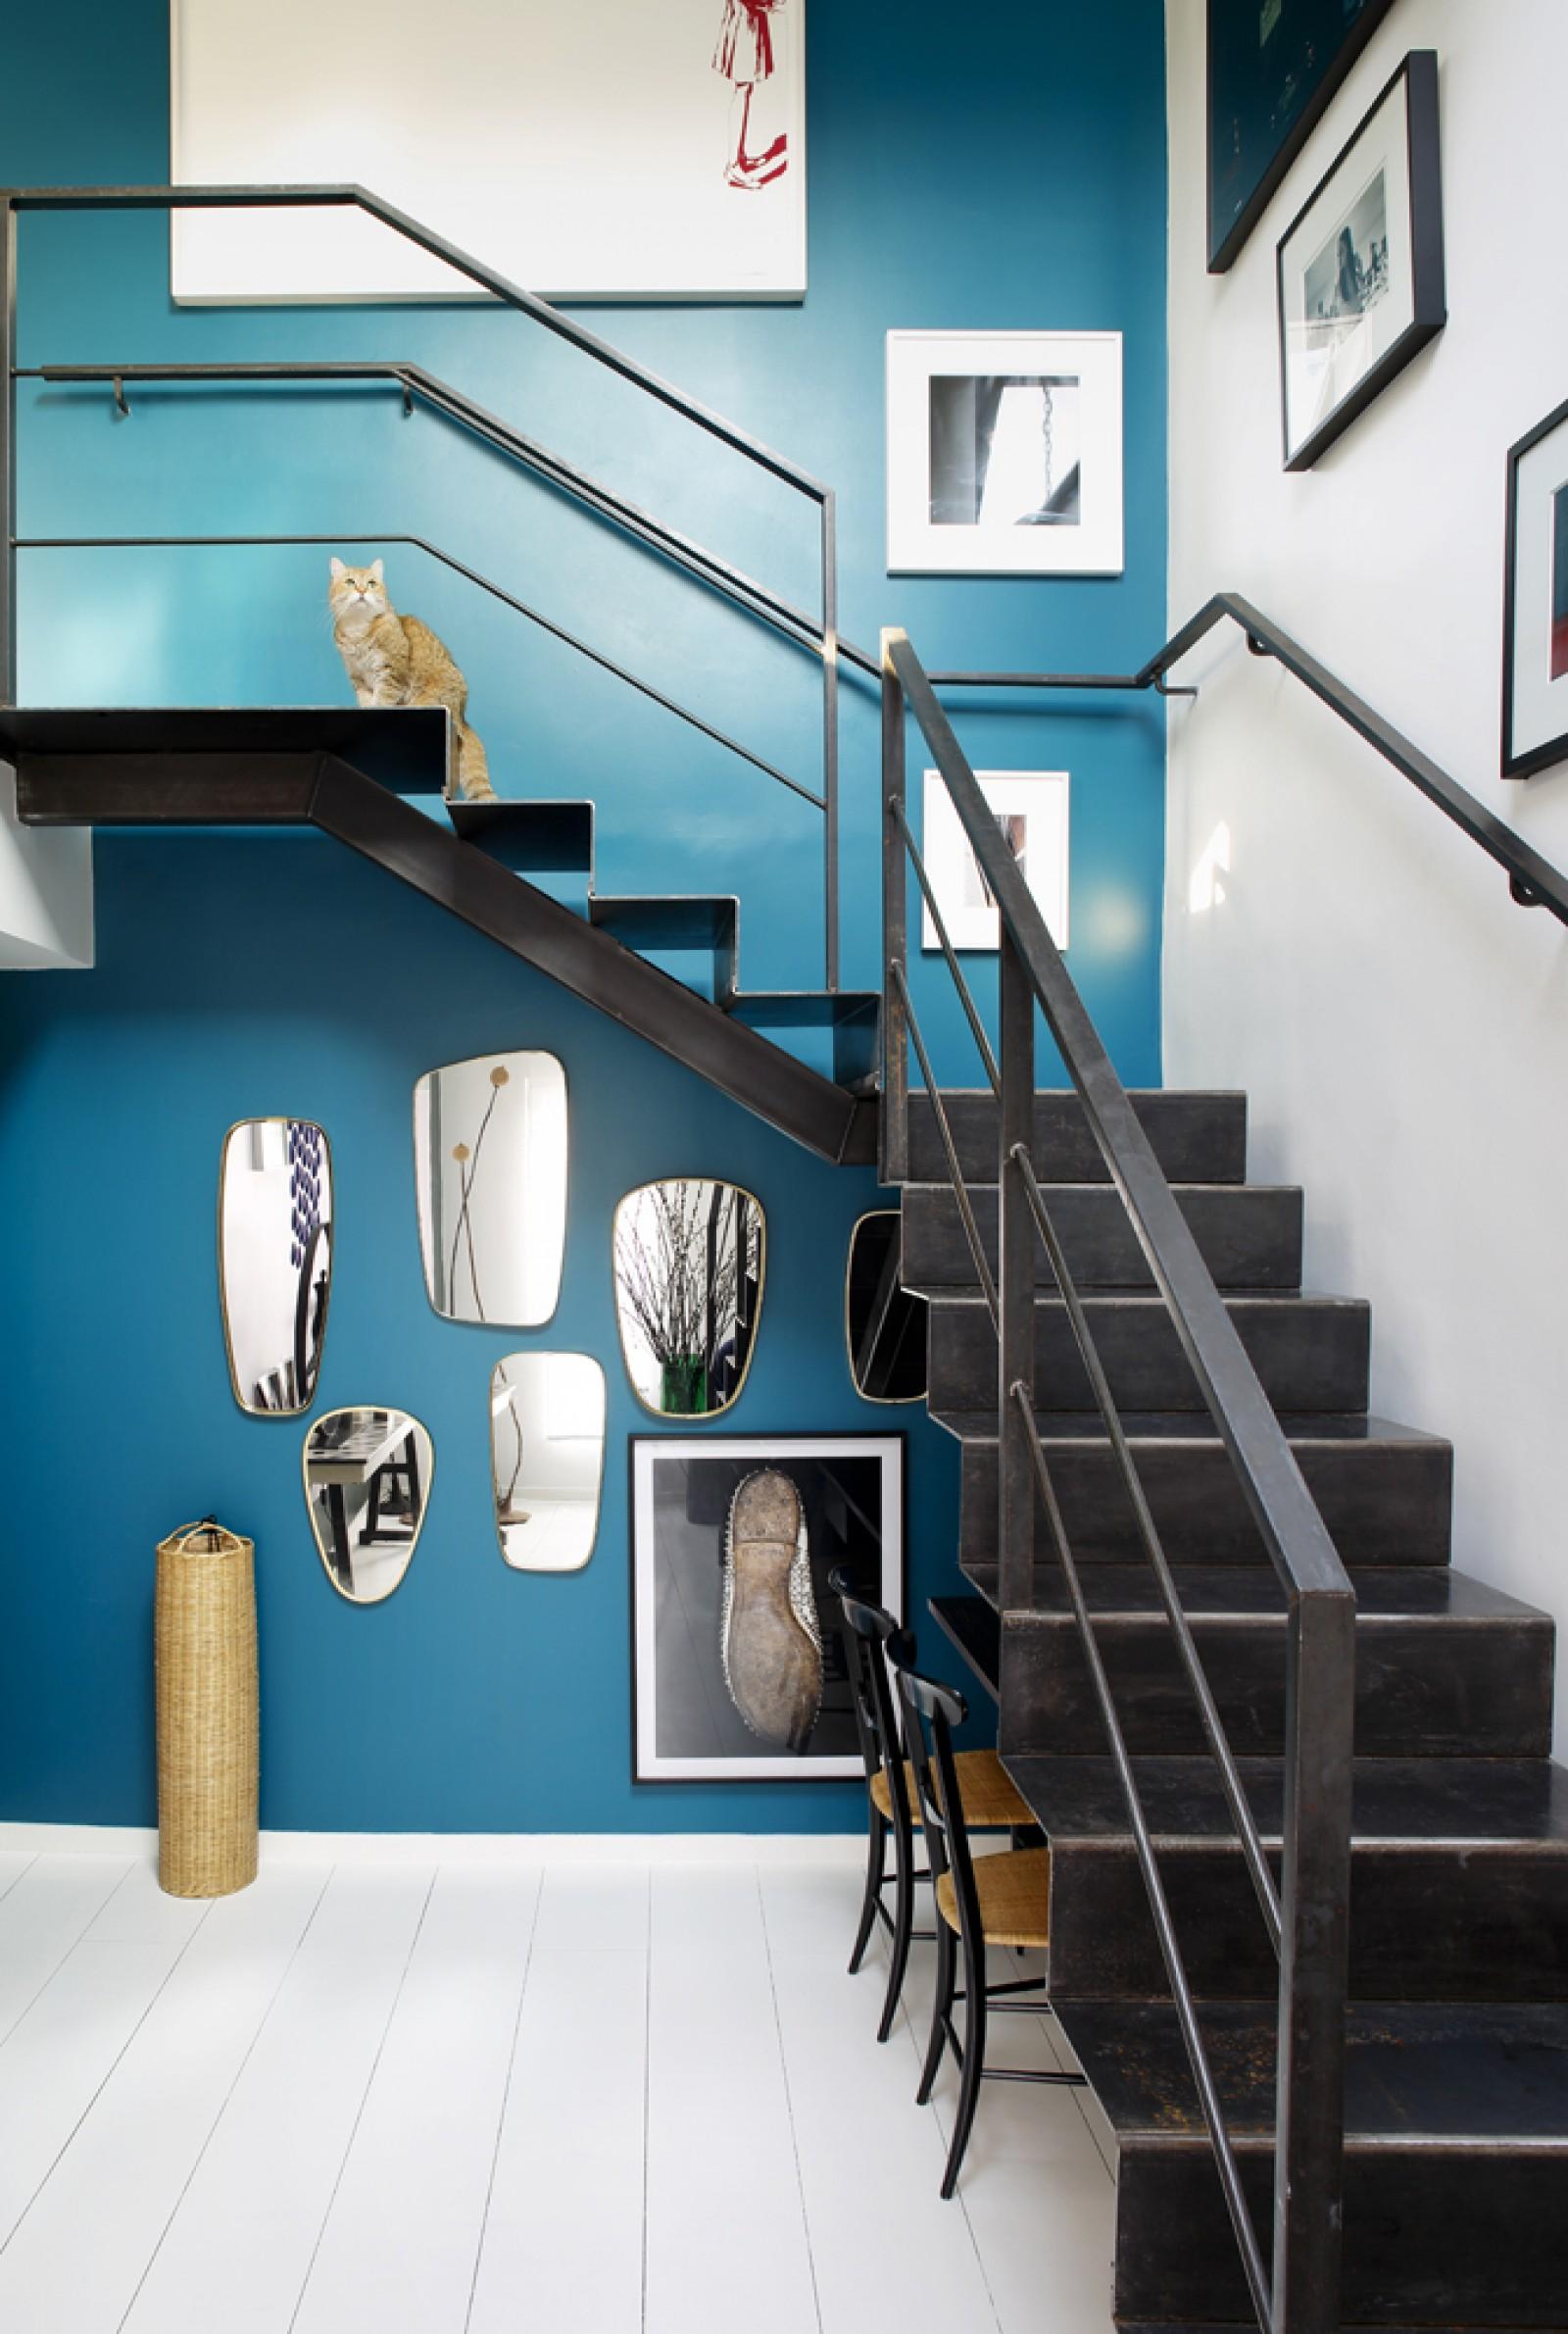 parisian duplex 1 Parisian Duplex by Sarah Lavoine